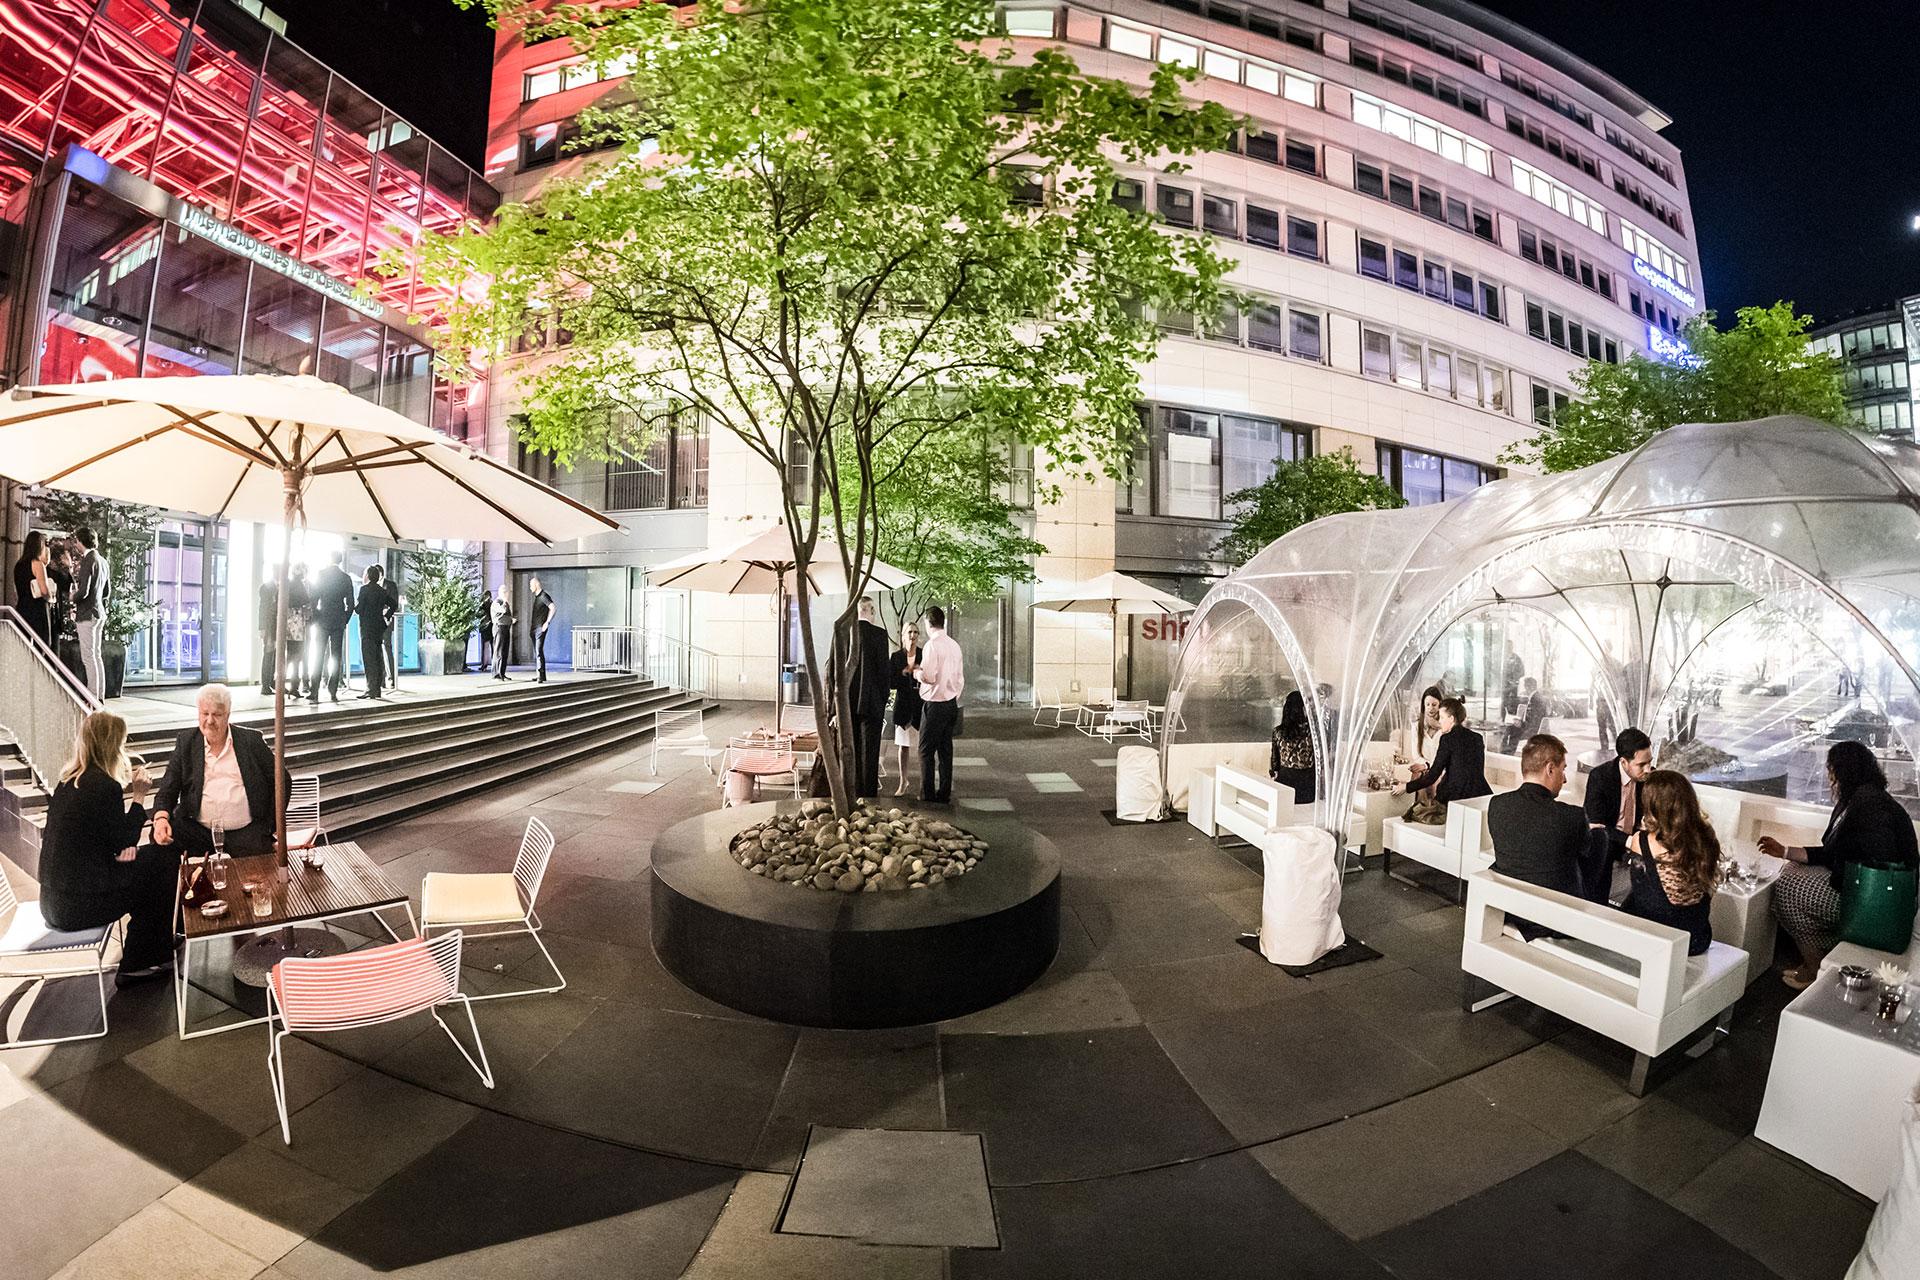 Jobs Nh Hotels Berlin